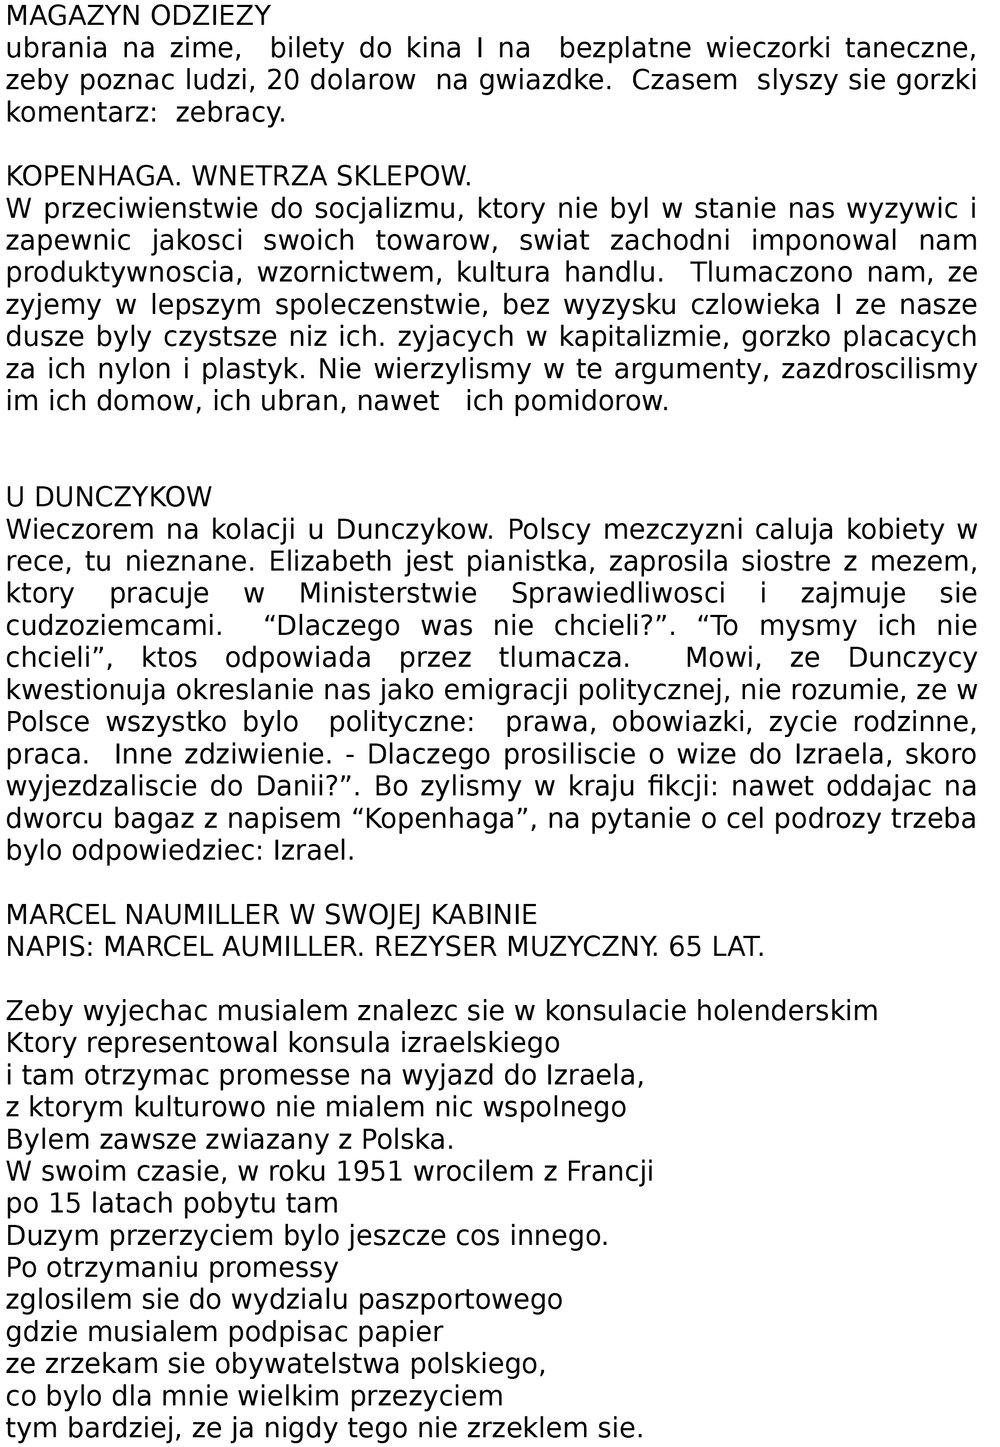 SKIBET-WERSJA-POLSKA-7.jpg